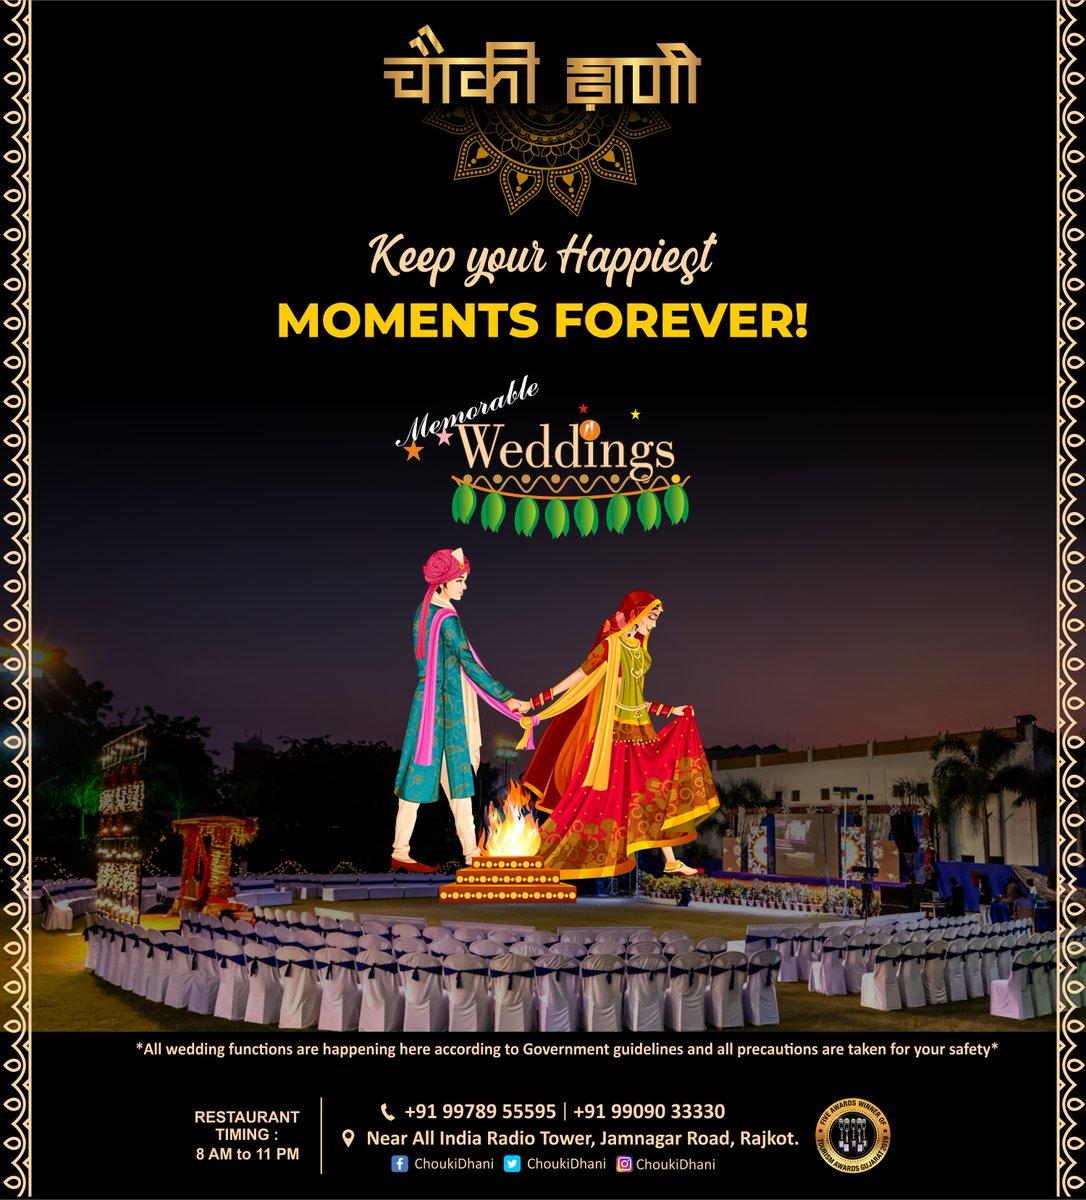 Keep your Happiest MOMENTS FOREVER!  Call on: 9978955595  #choukidhaniresort #rajkot #wedding #weddingday #weddinginspiration #function #weddingplanner  #engagement #weddingideas #weddingdecor #destinationwedding